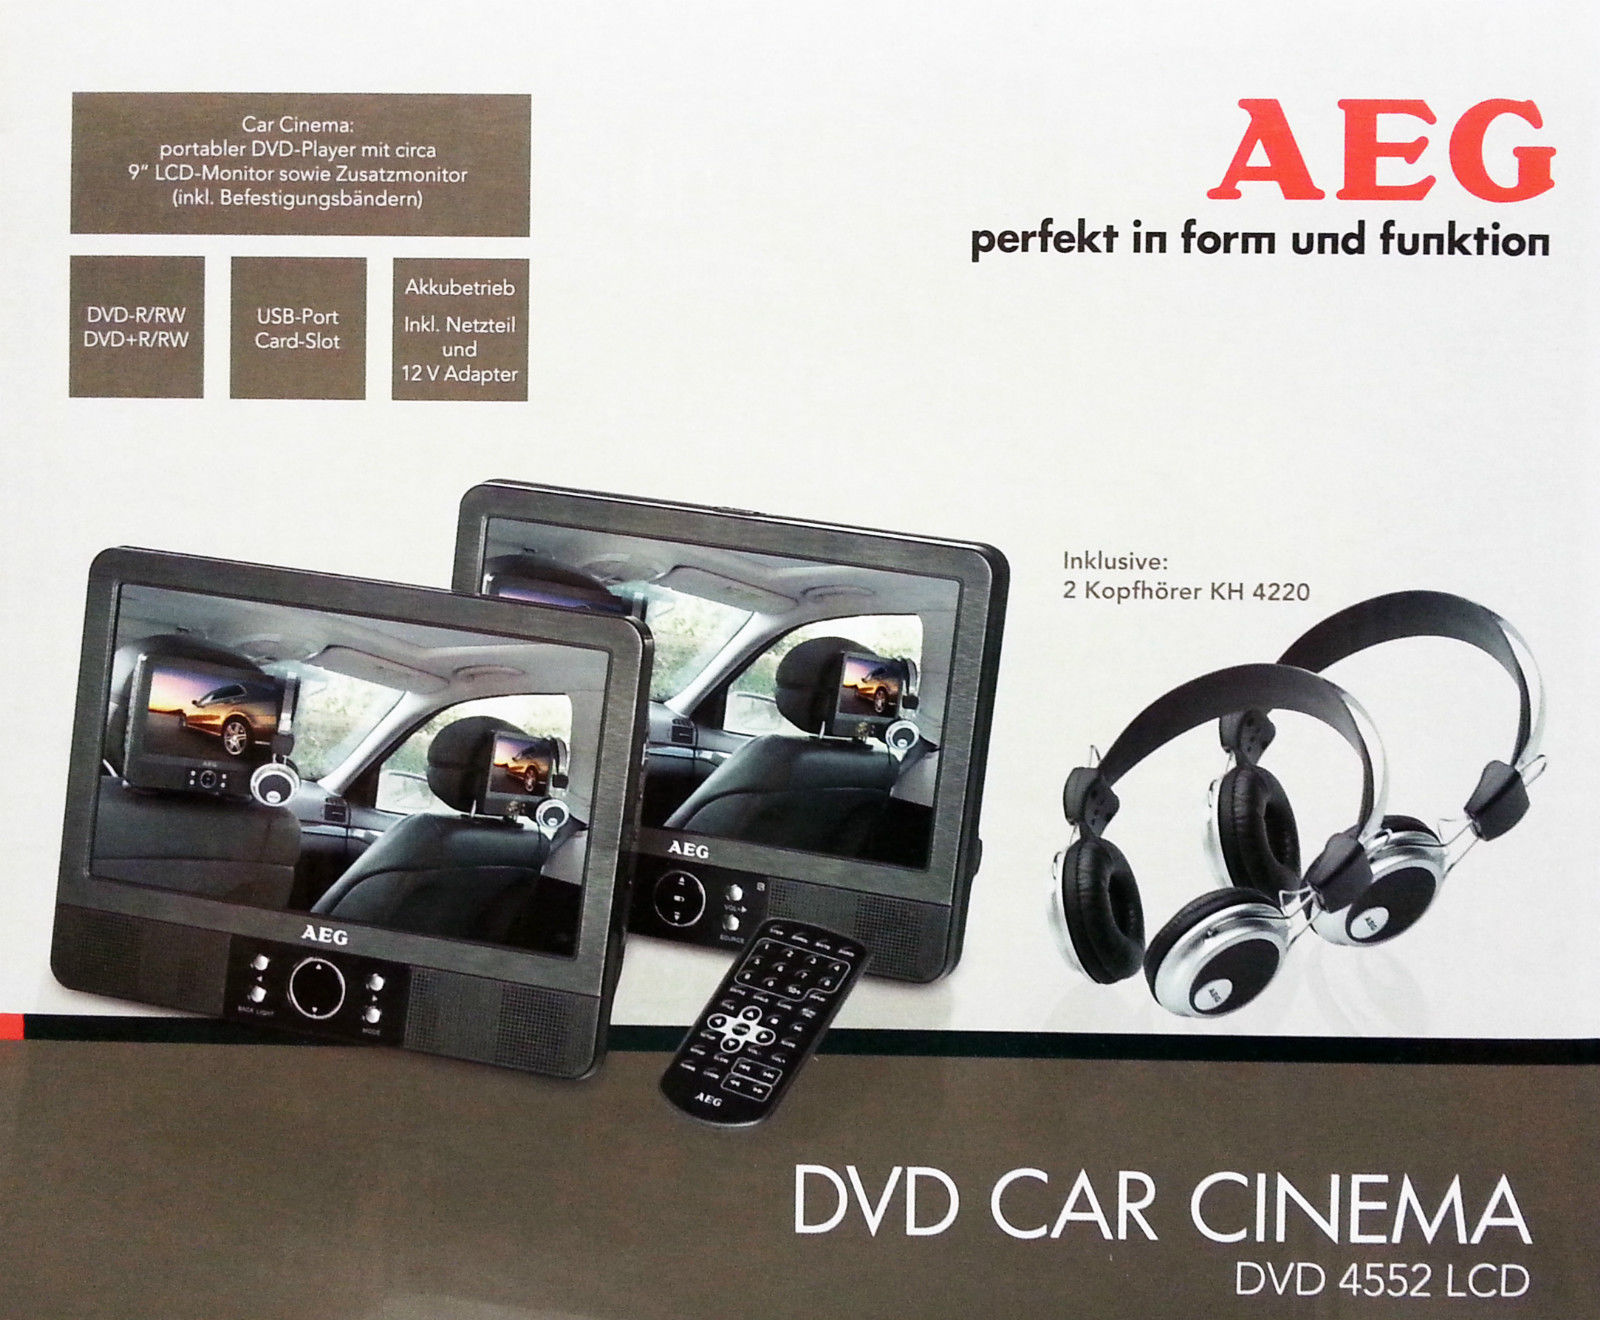 aeg dvd 4552 9 twin duo monitor dvd player car cinema mit. Black Bedroom Furniture Sets. Home Design Ideas